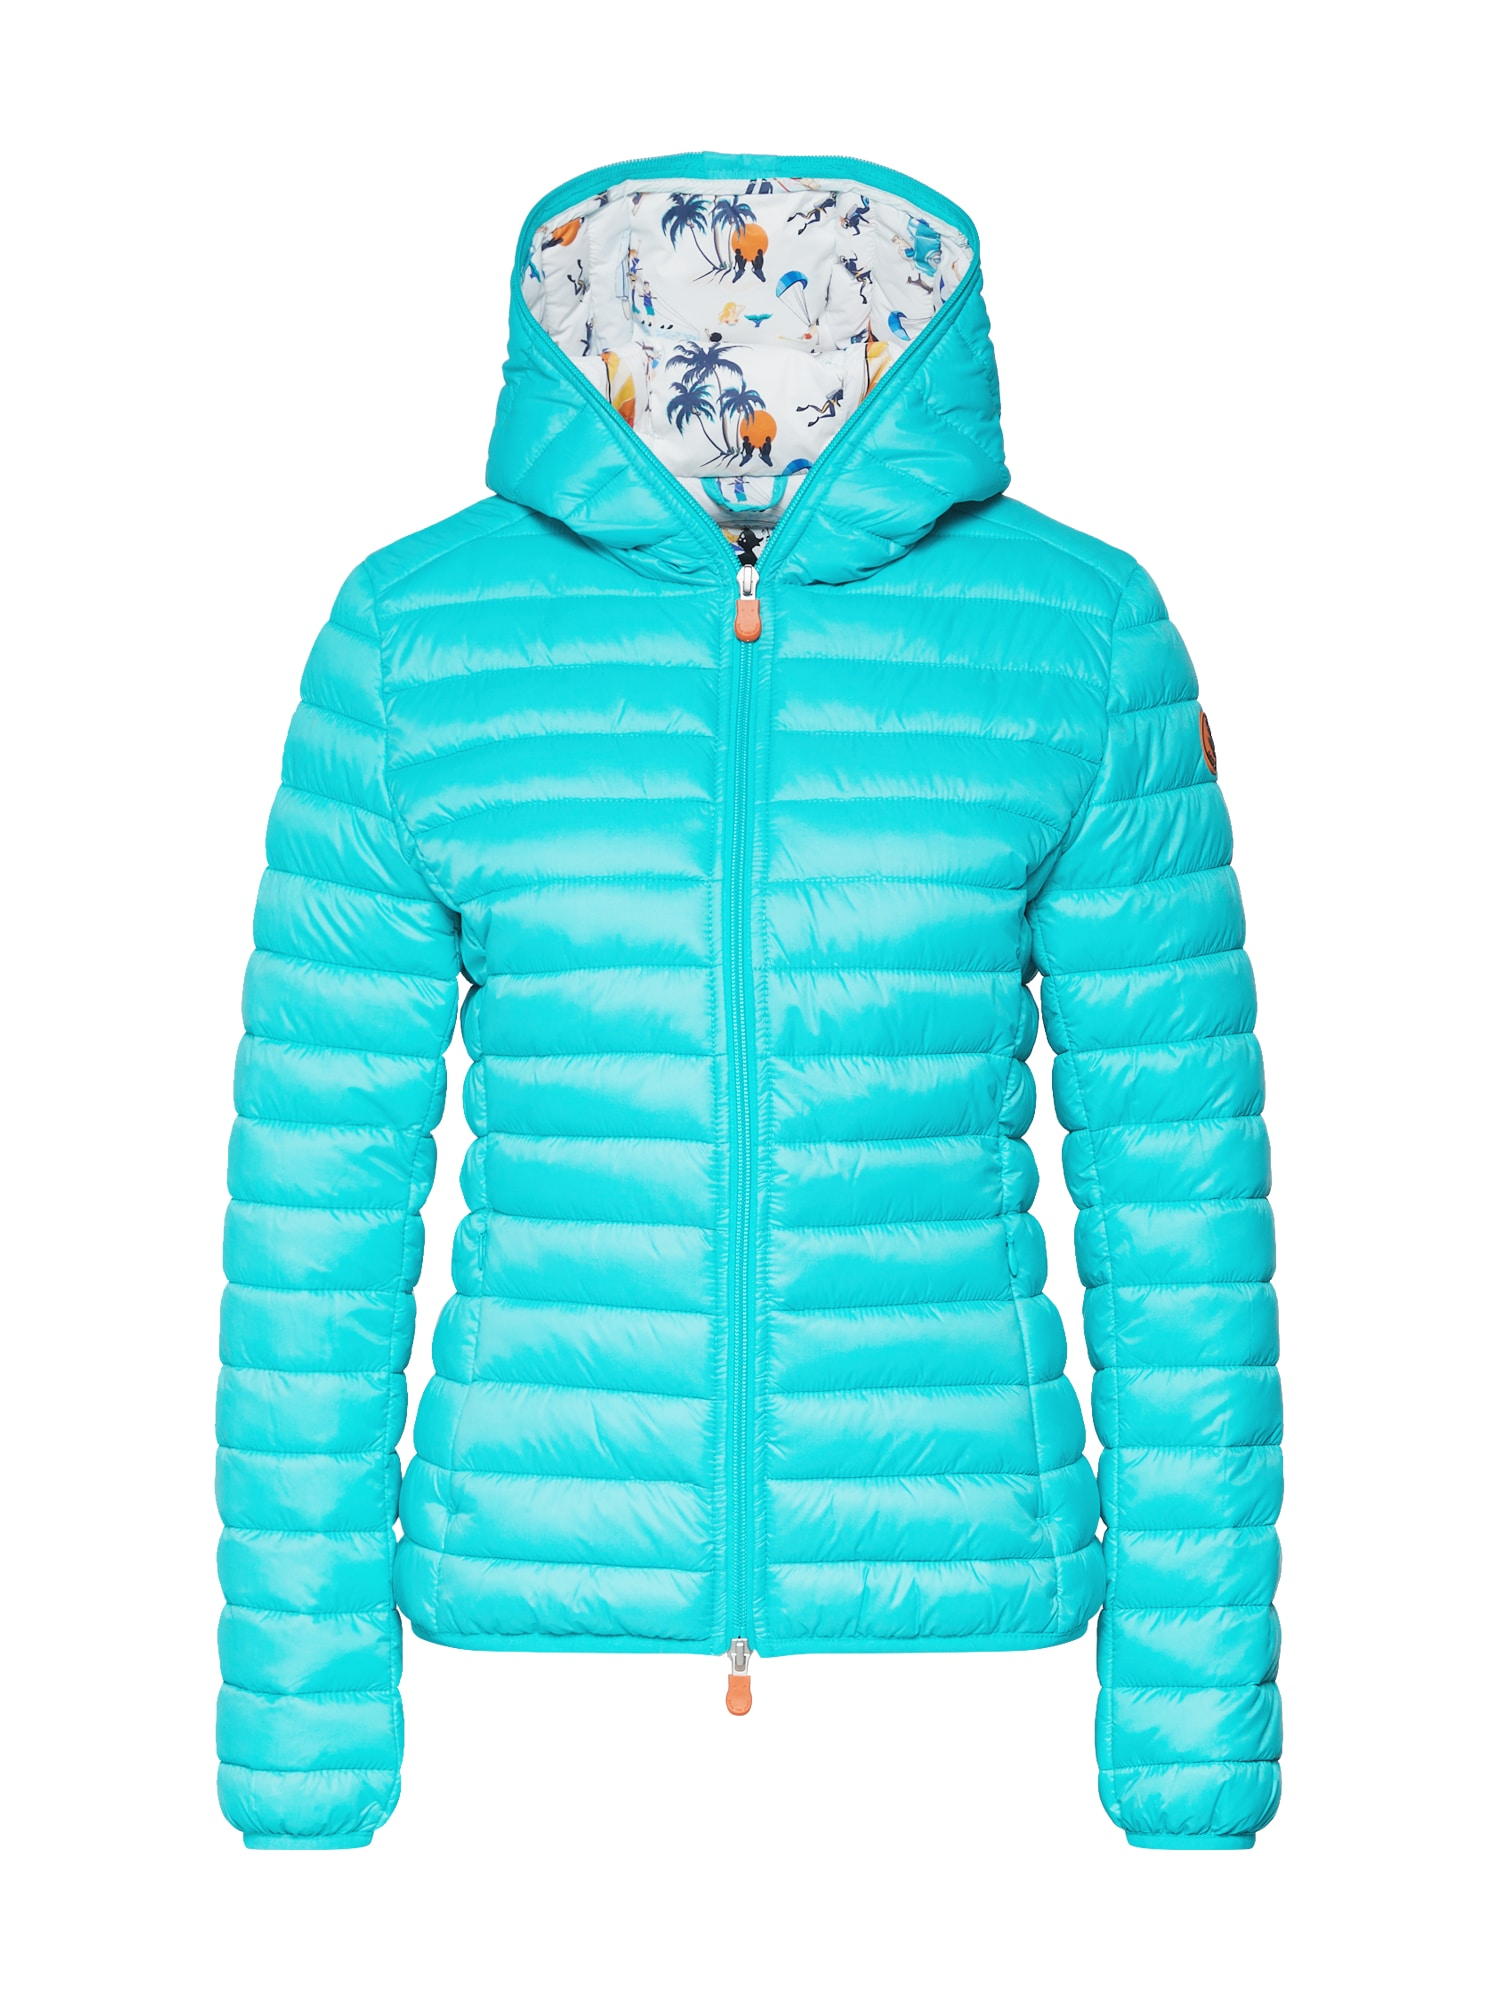 Zimní bunda GIUBBOTTO CAPPUCCIO mix barev SAVE THE DUCK